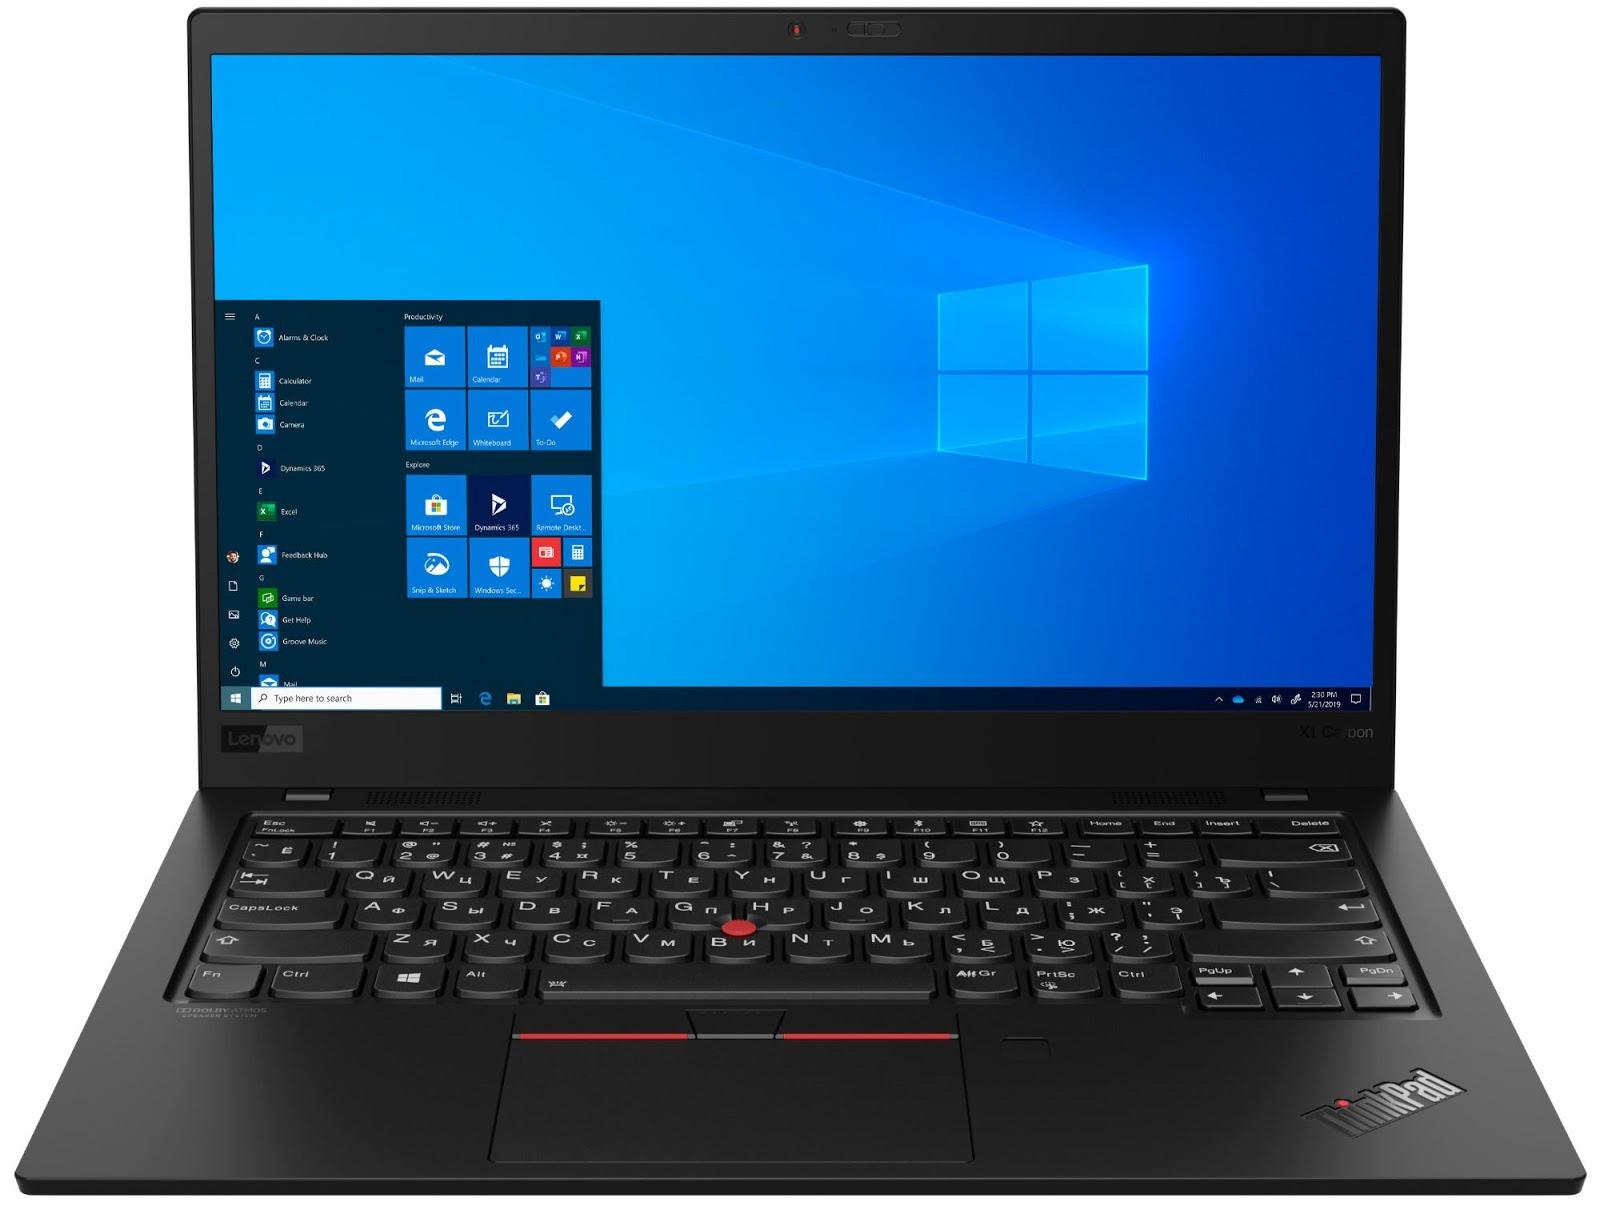 Фото 4. Lenovo ThinkPad X1 Carbon 7th Gen Black (20QD003GRT)